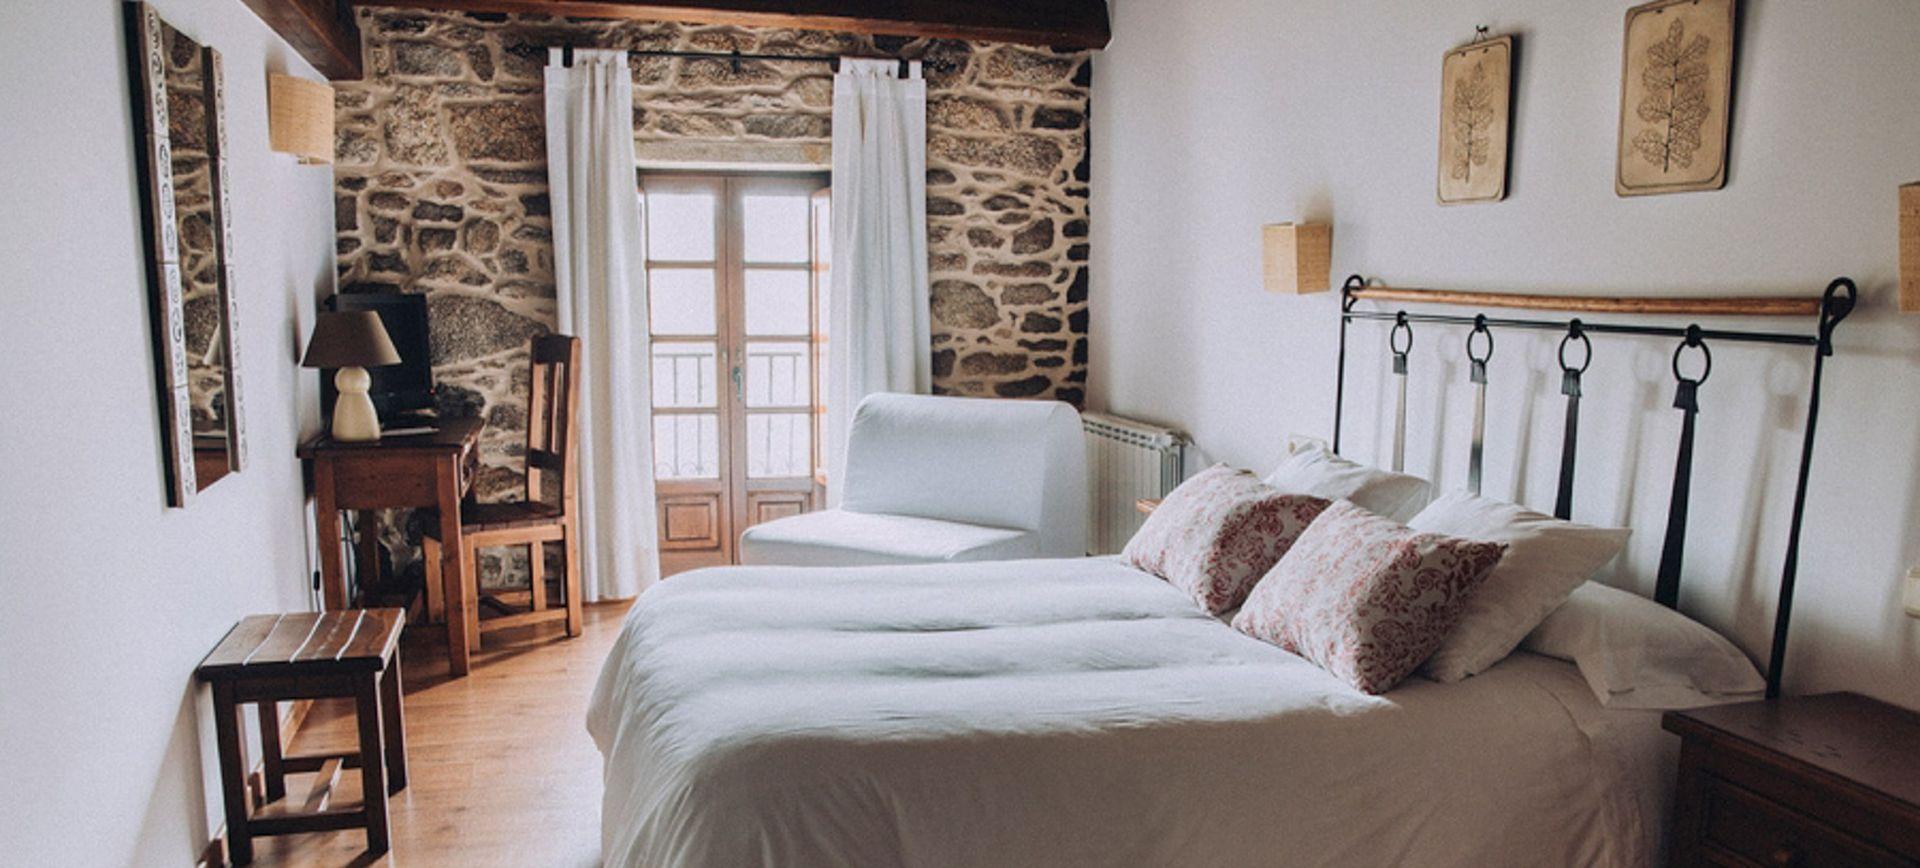 galicia wedding package - accommodation